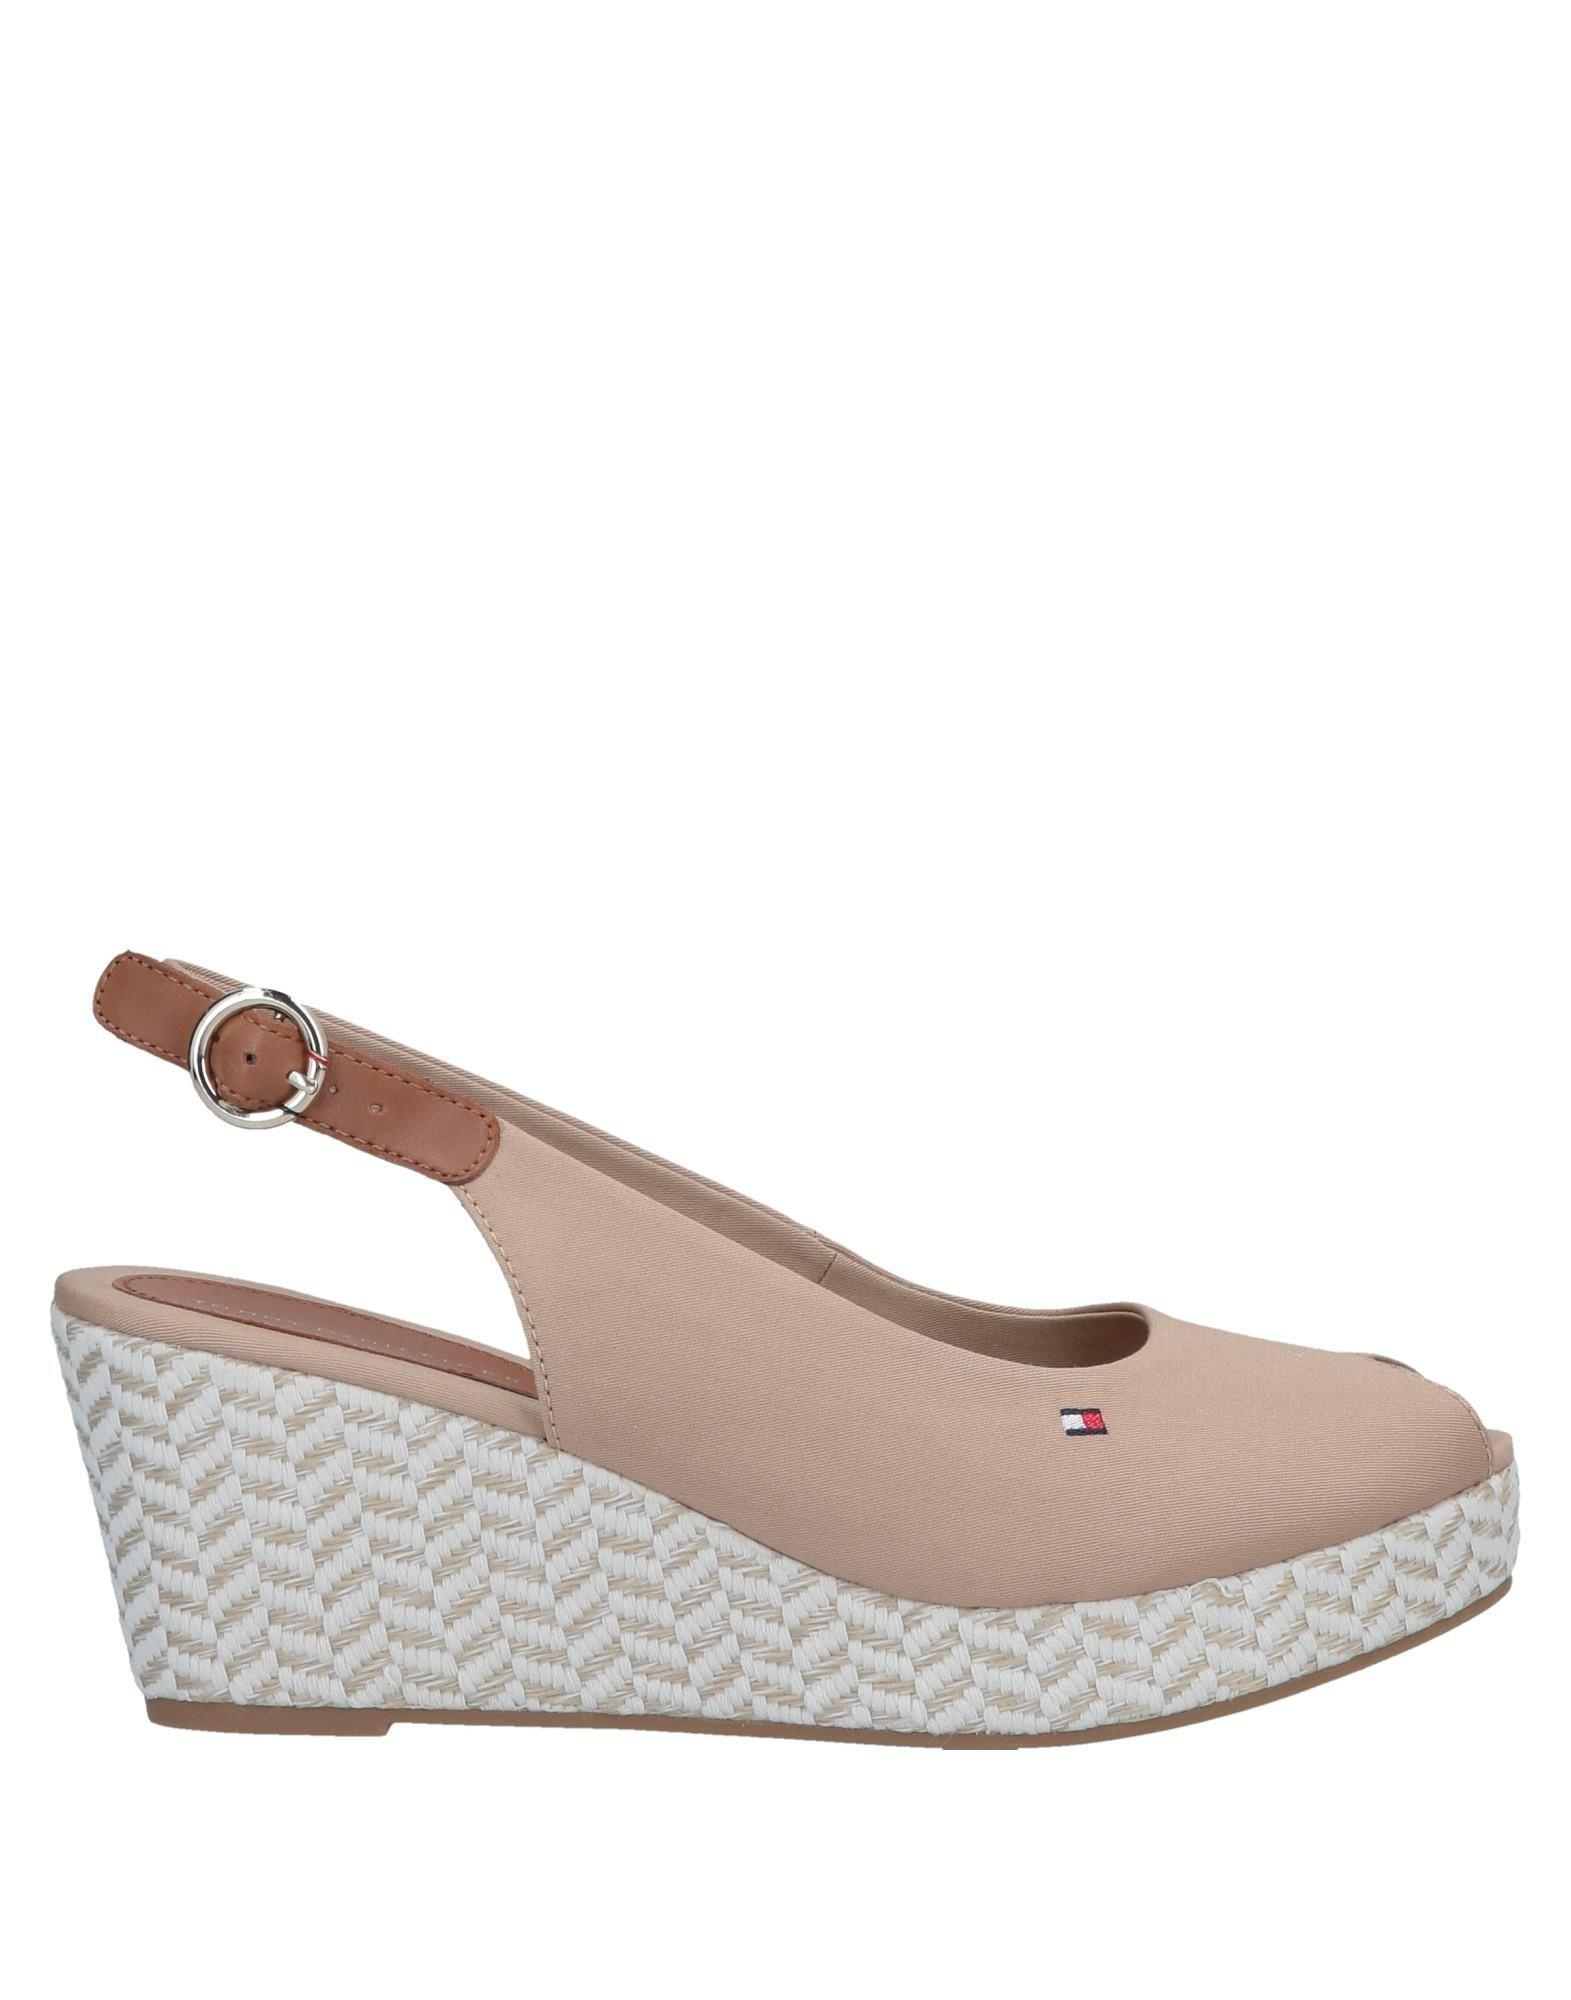 45bf62e6f9fbfc Tommy Hilfiger. Women s Sandals